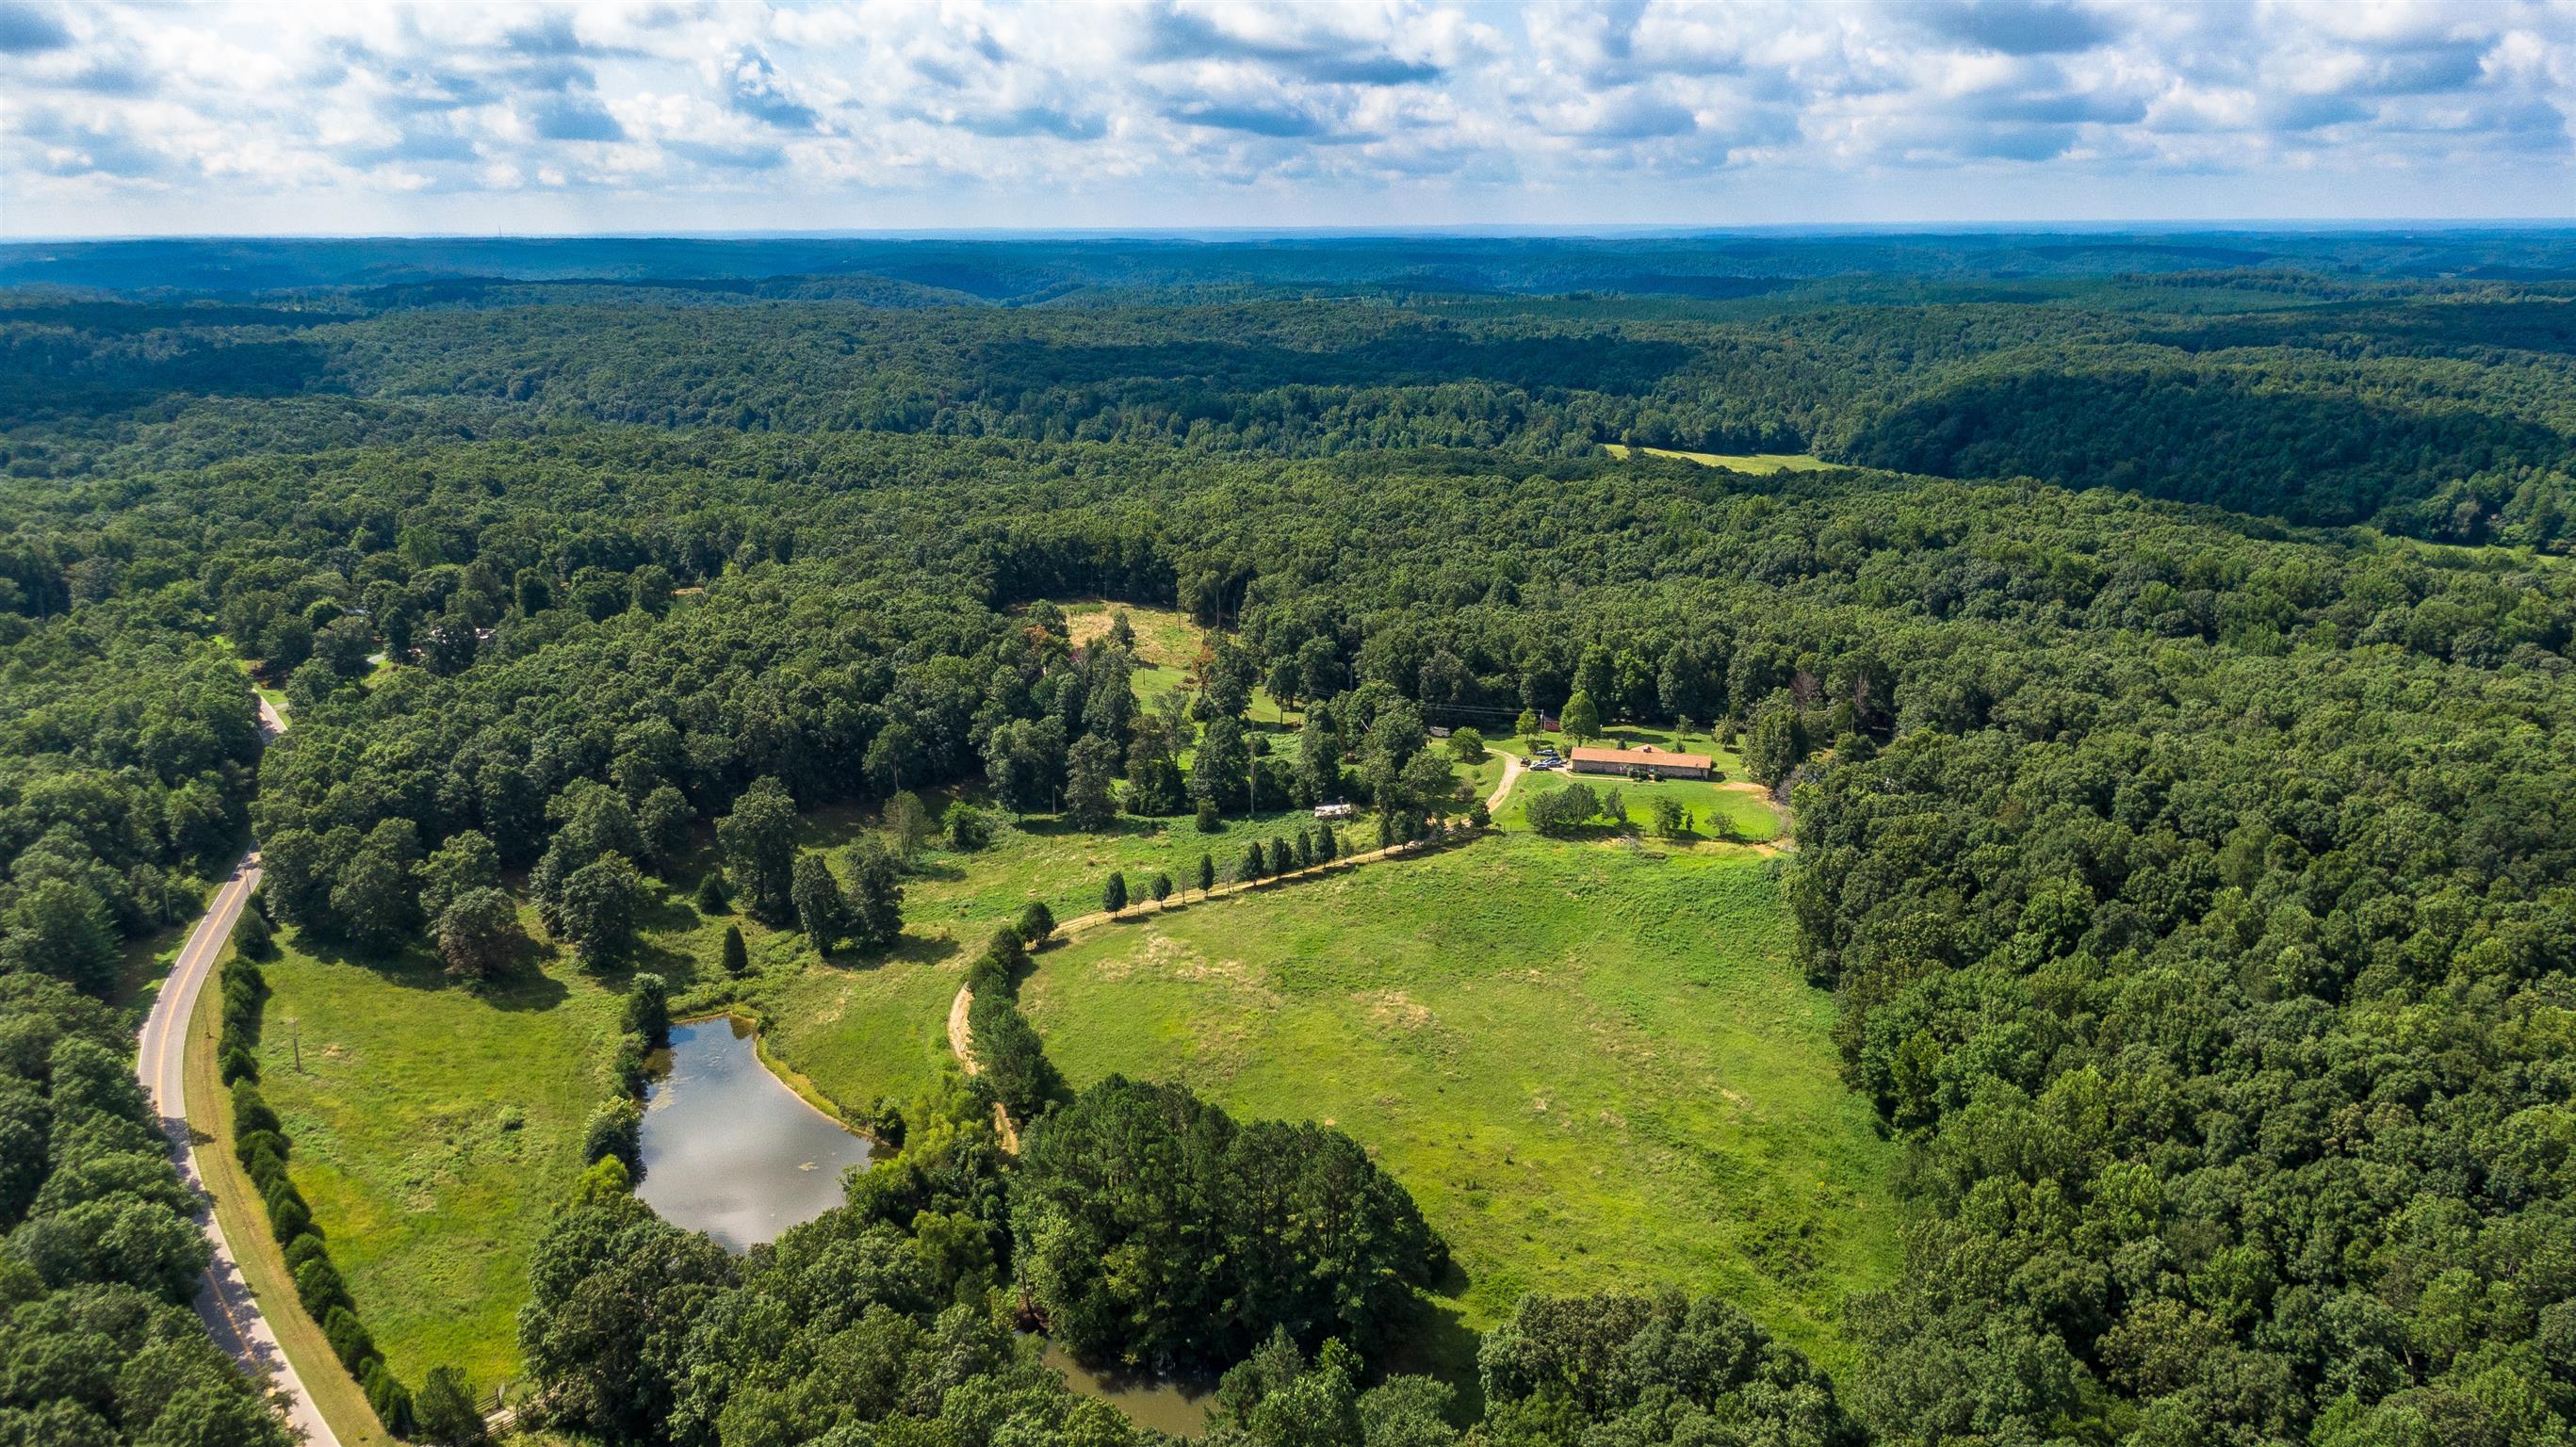 7564 Pinewood Rd, Nunnelly, TN 37137 - Nunnelly, TN real estate listing